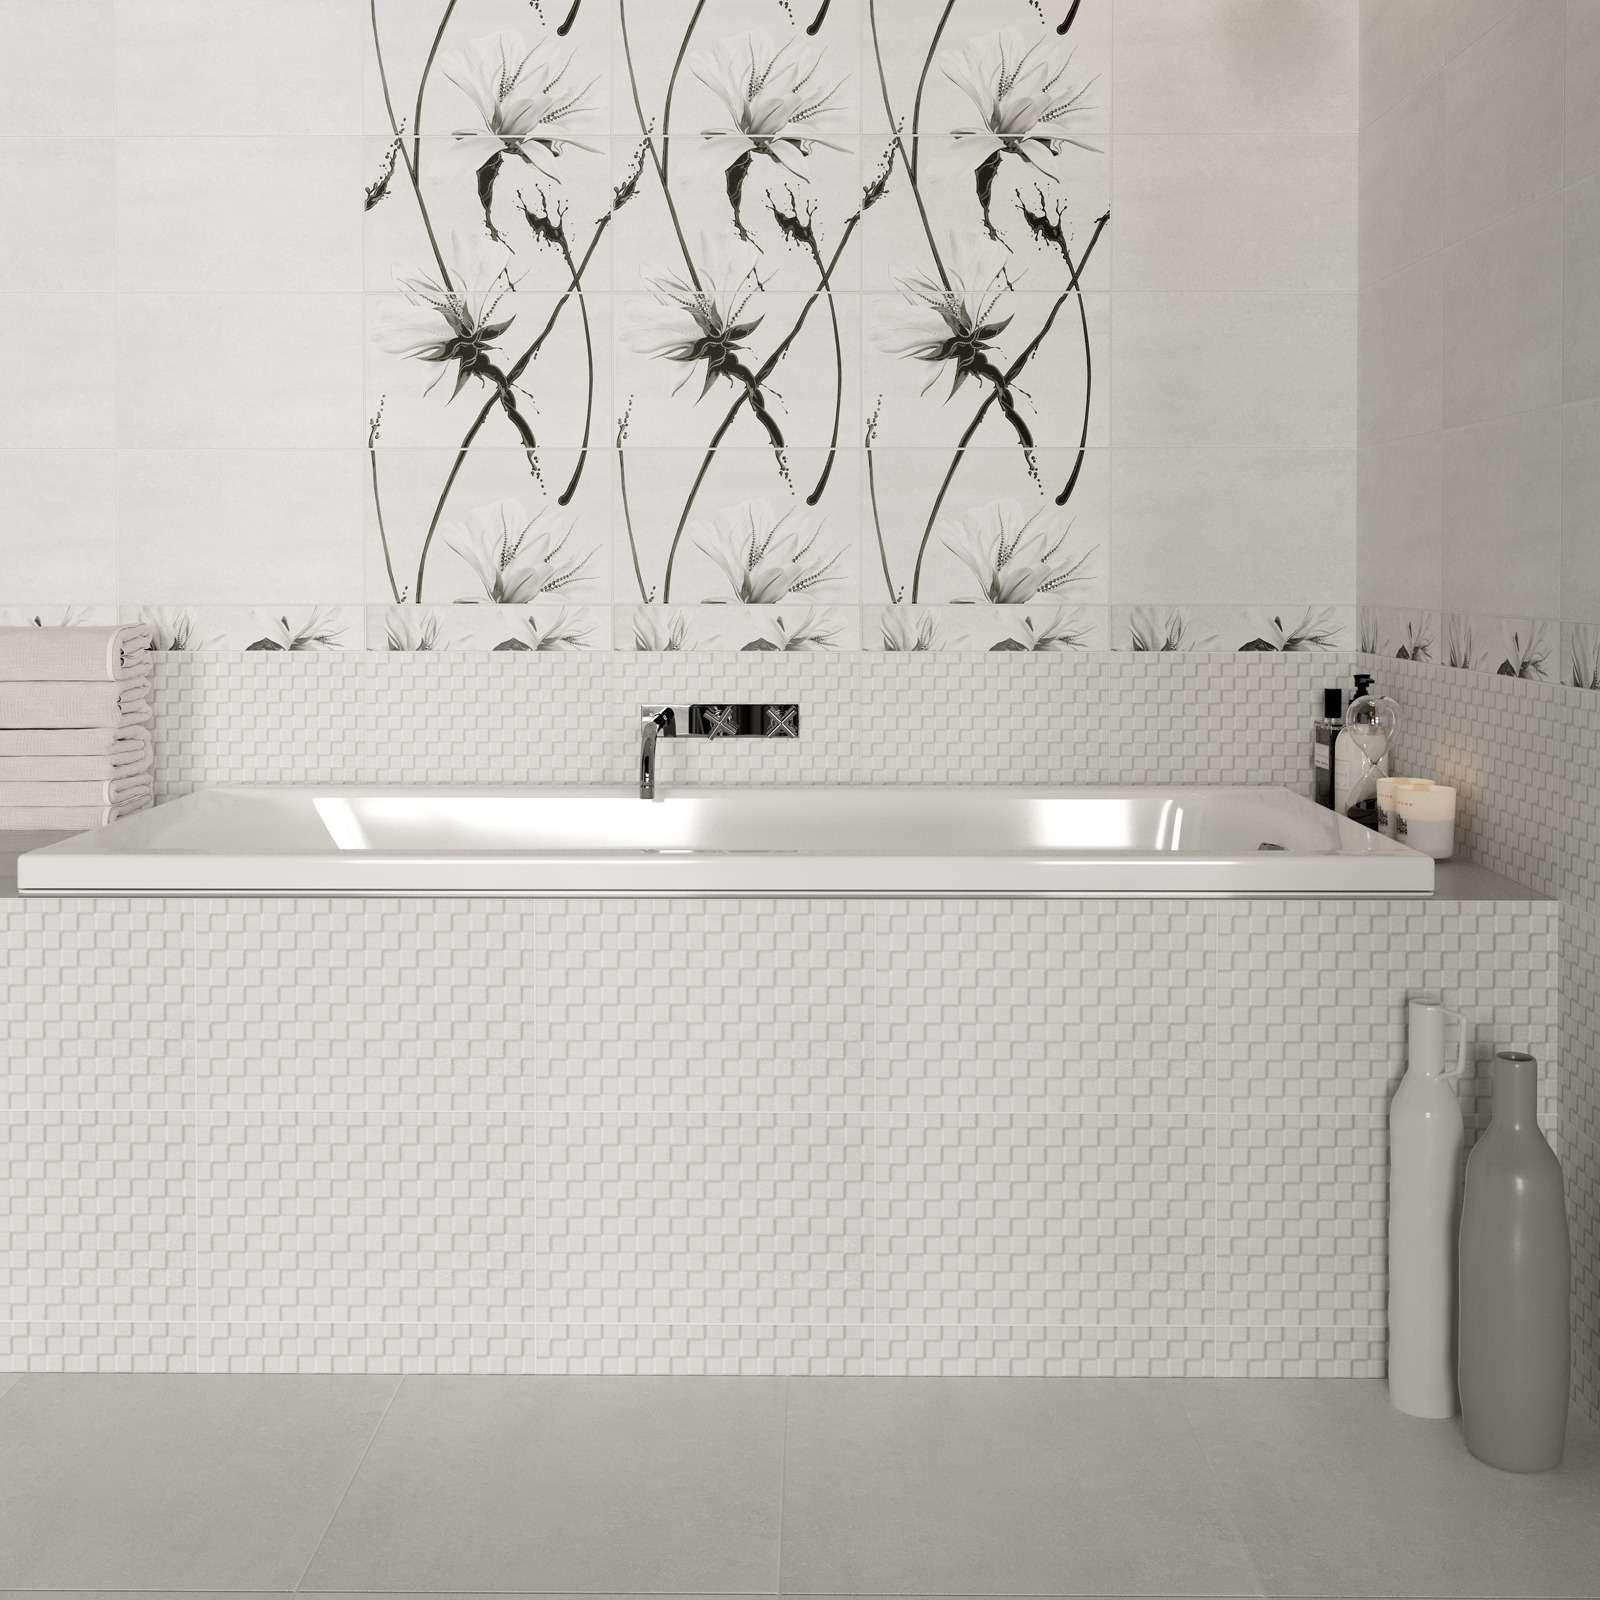 Плитка обл. 250х400мм Картье серый низ 02, Шахты